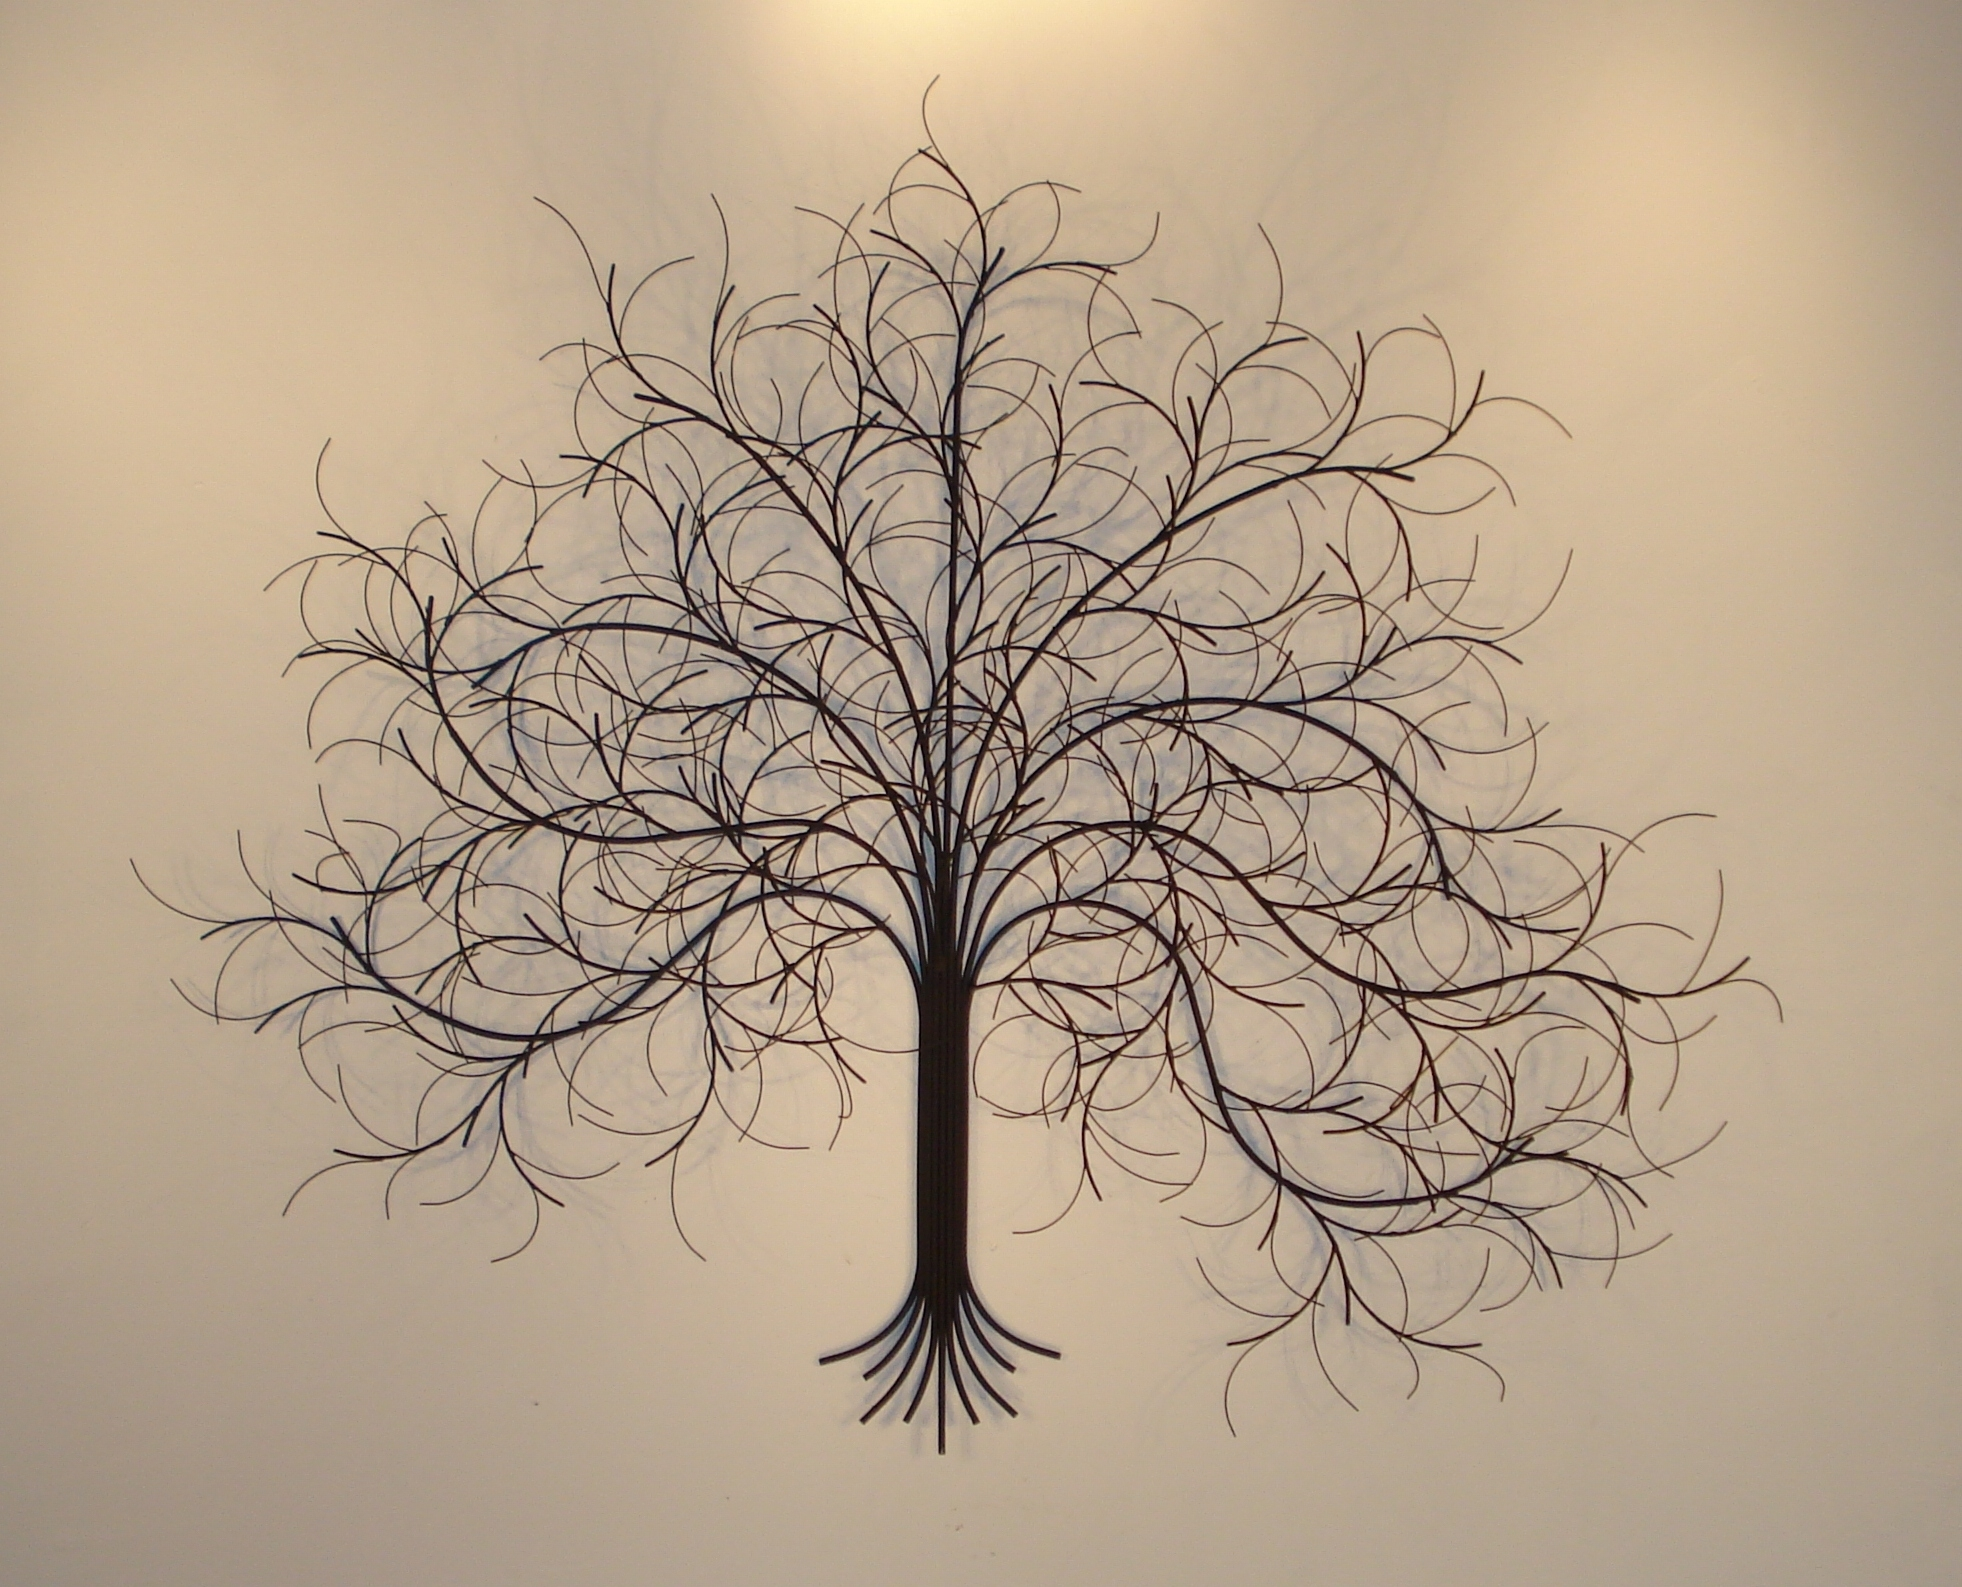 March Tree Metal Wall Art - Metal Sculpture And Wall Decor - Gurtan regarding Metal Wall Art Trees (Image 5 of 20)